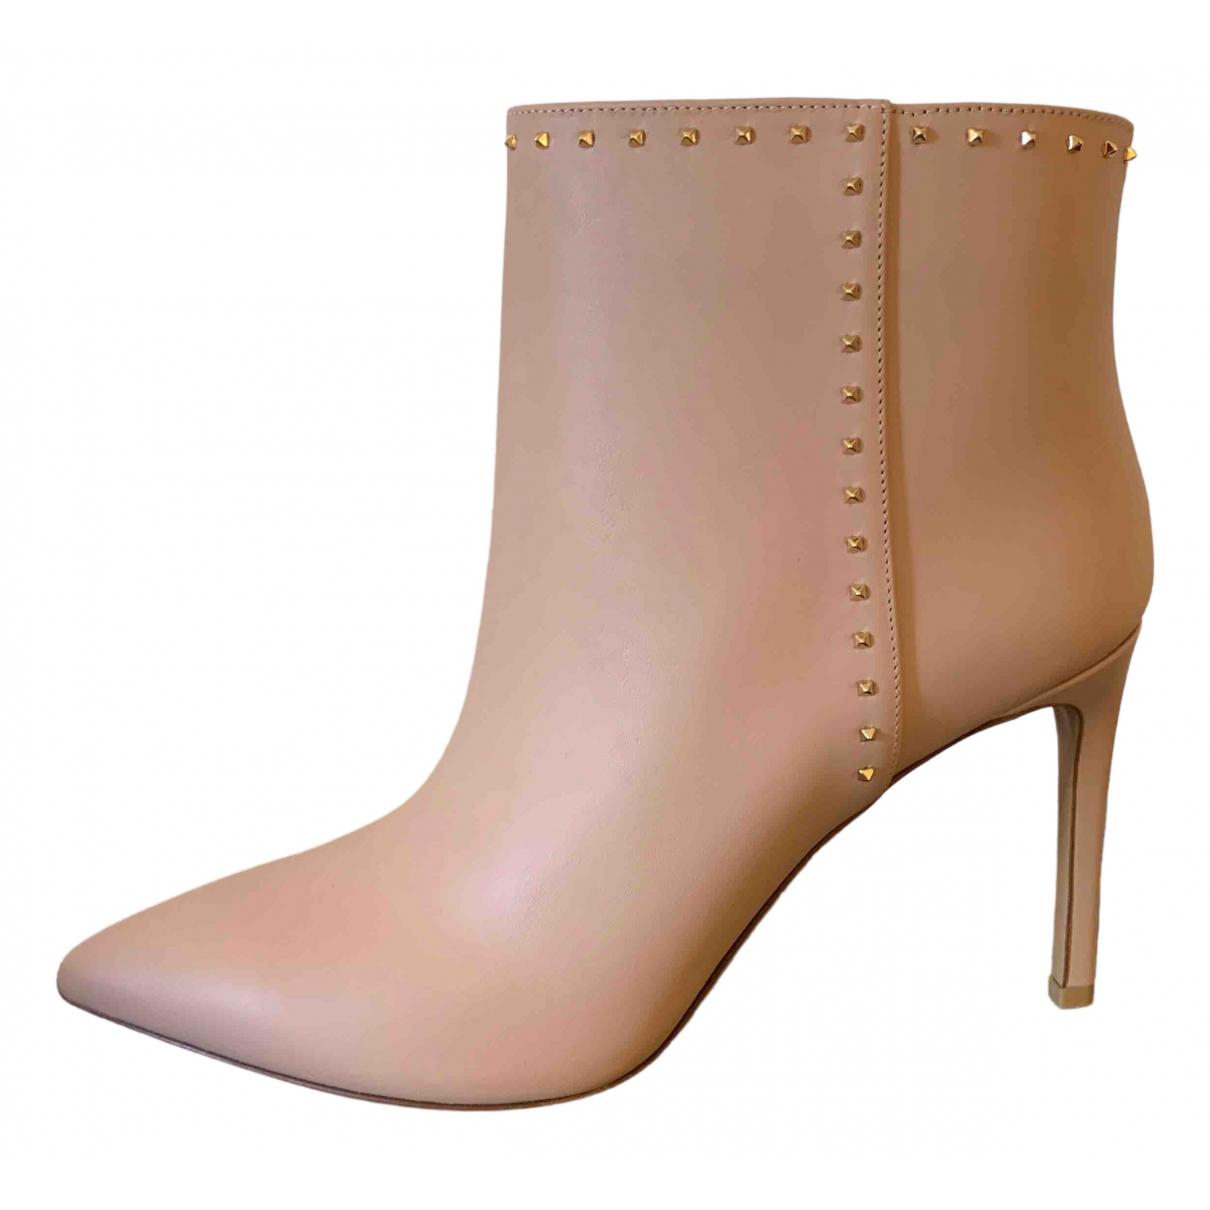 Valentino Garavani Rockstud Beige Leather Ankle boots for Women 39 EU